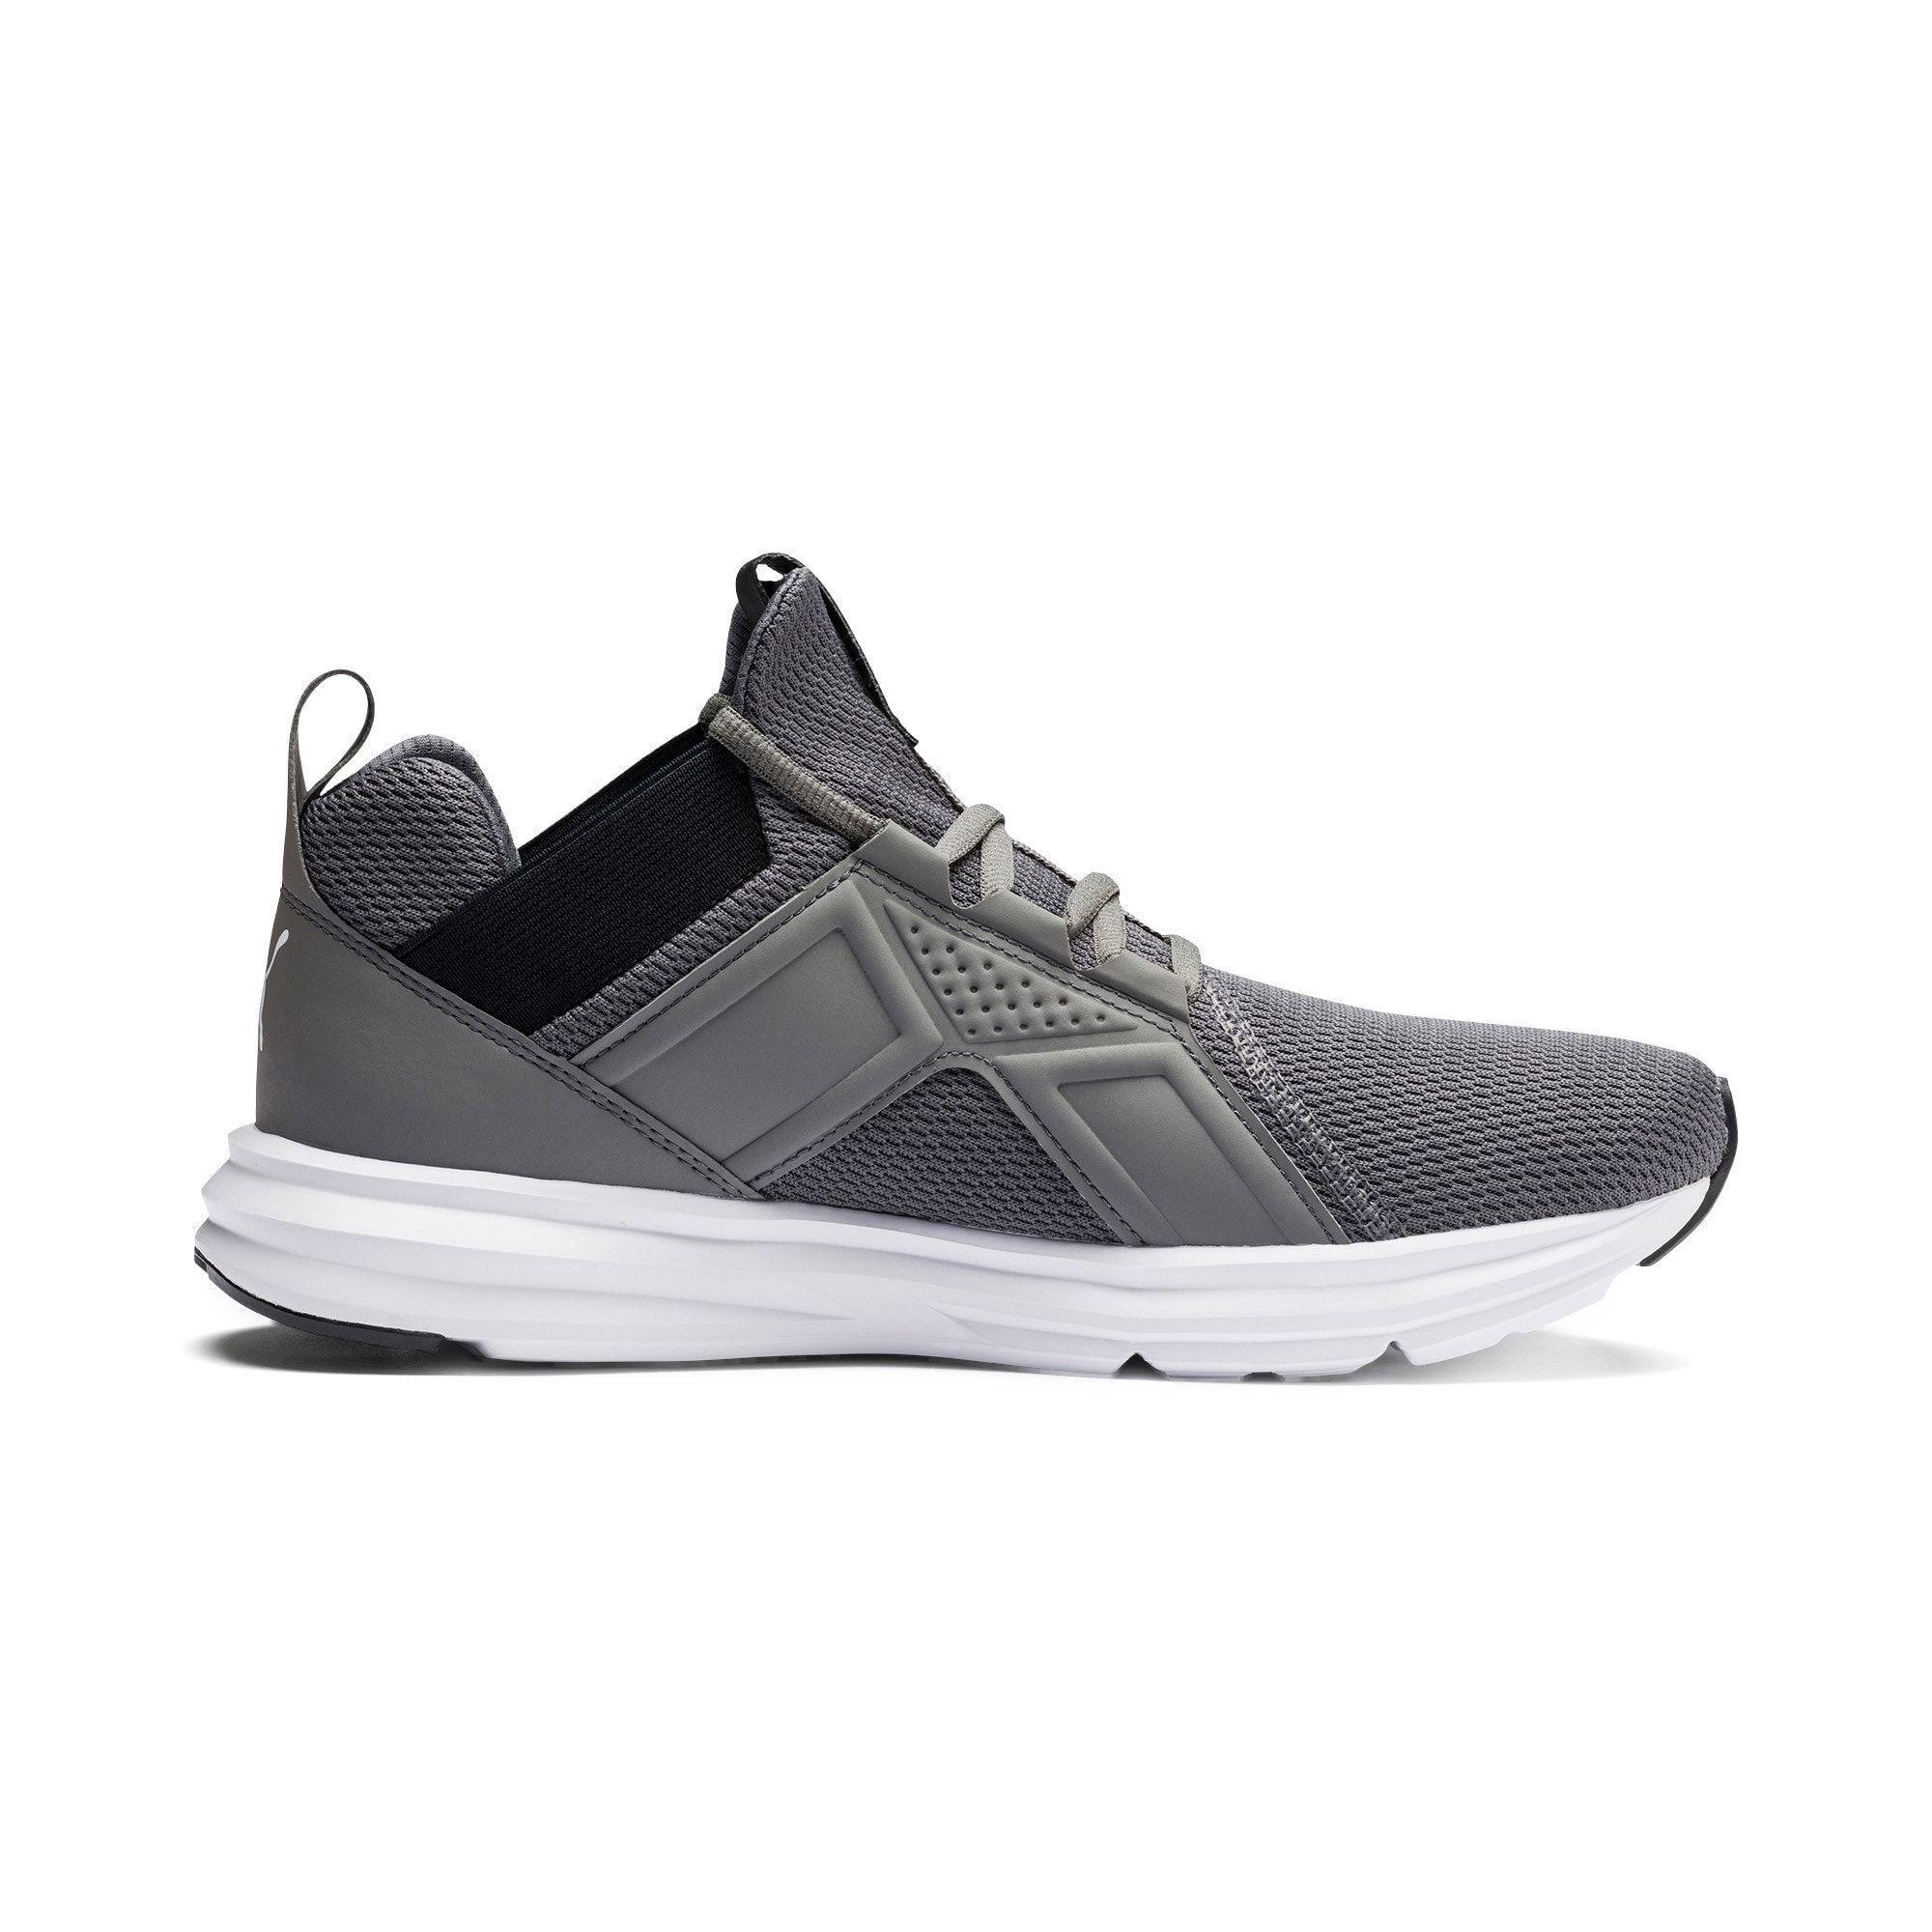 enzo #grey #mens #puma #running #shoes